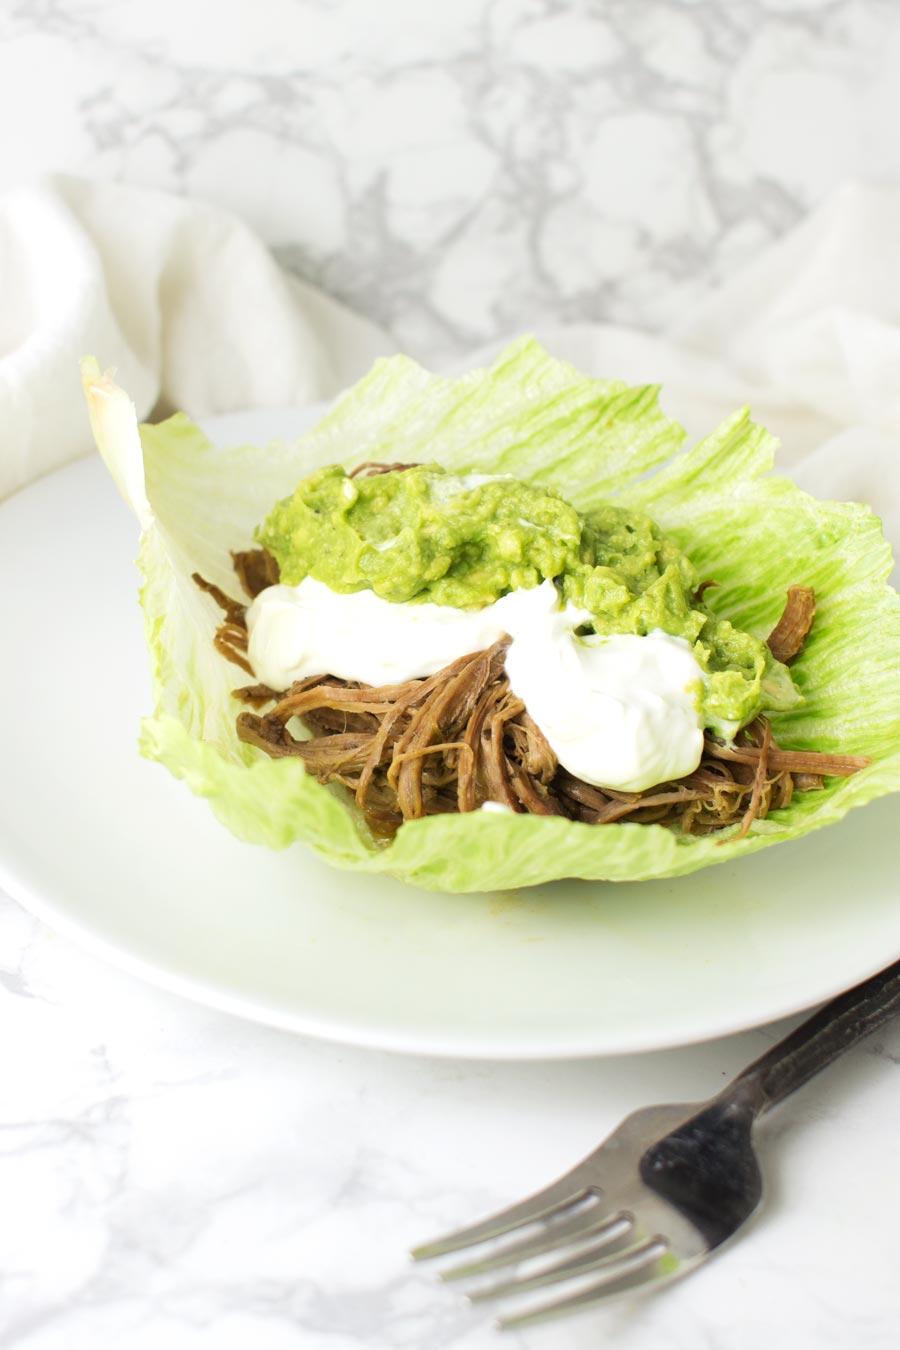 Beef Tongue Barbacoa recipe from acleanplate.com #paleo #aip #glutenfree